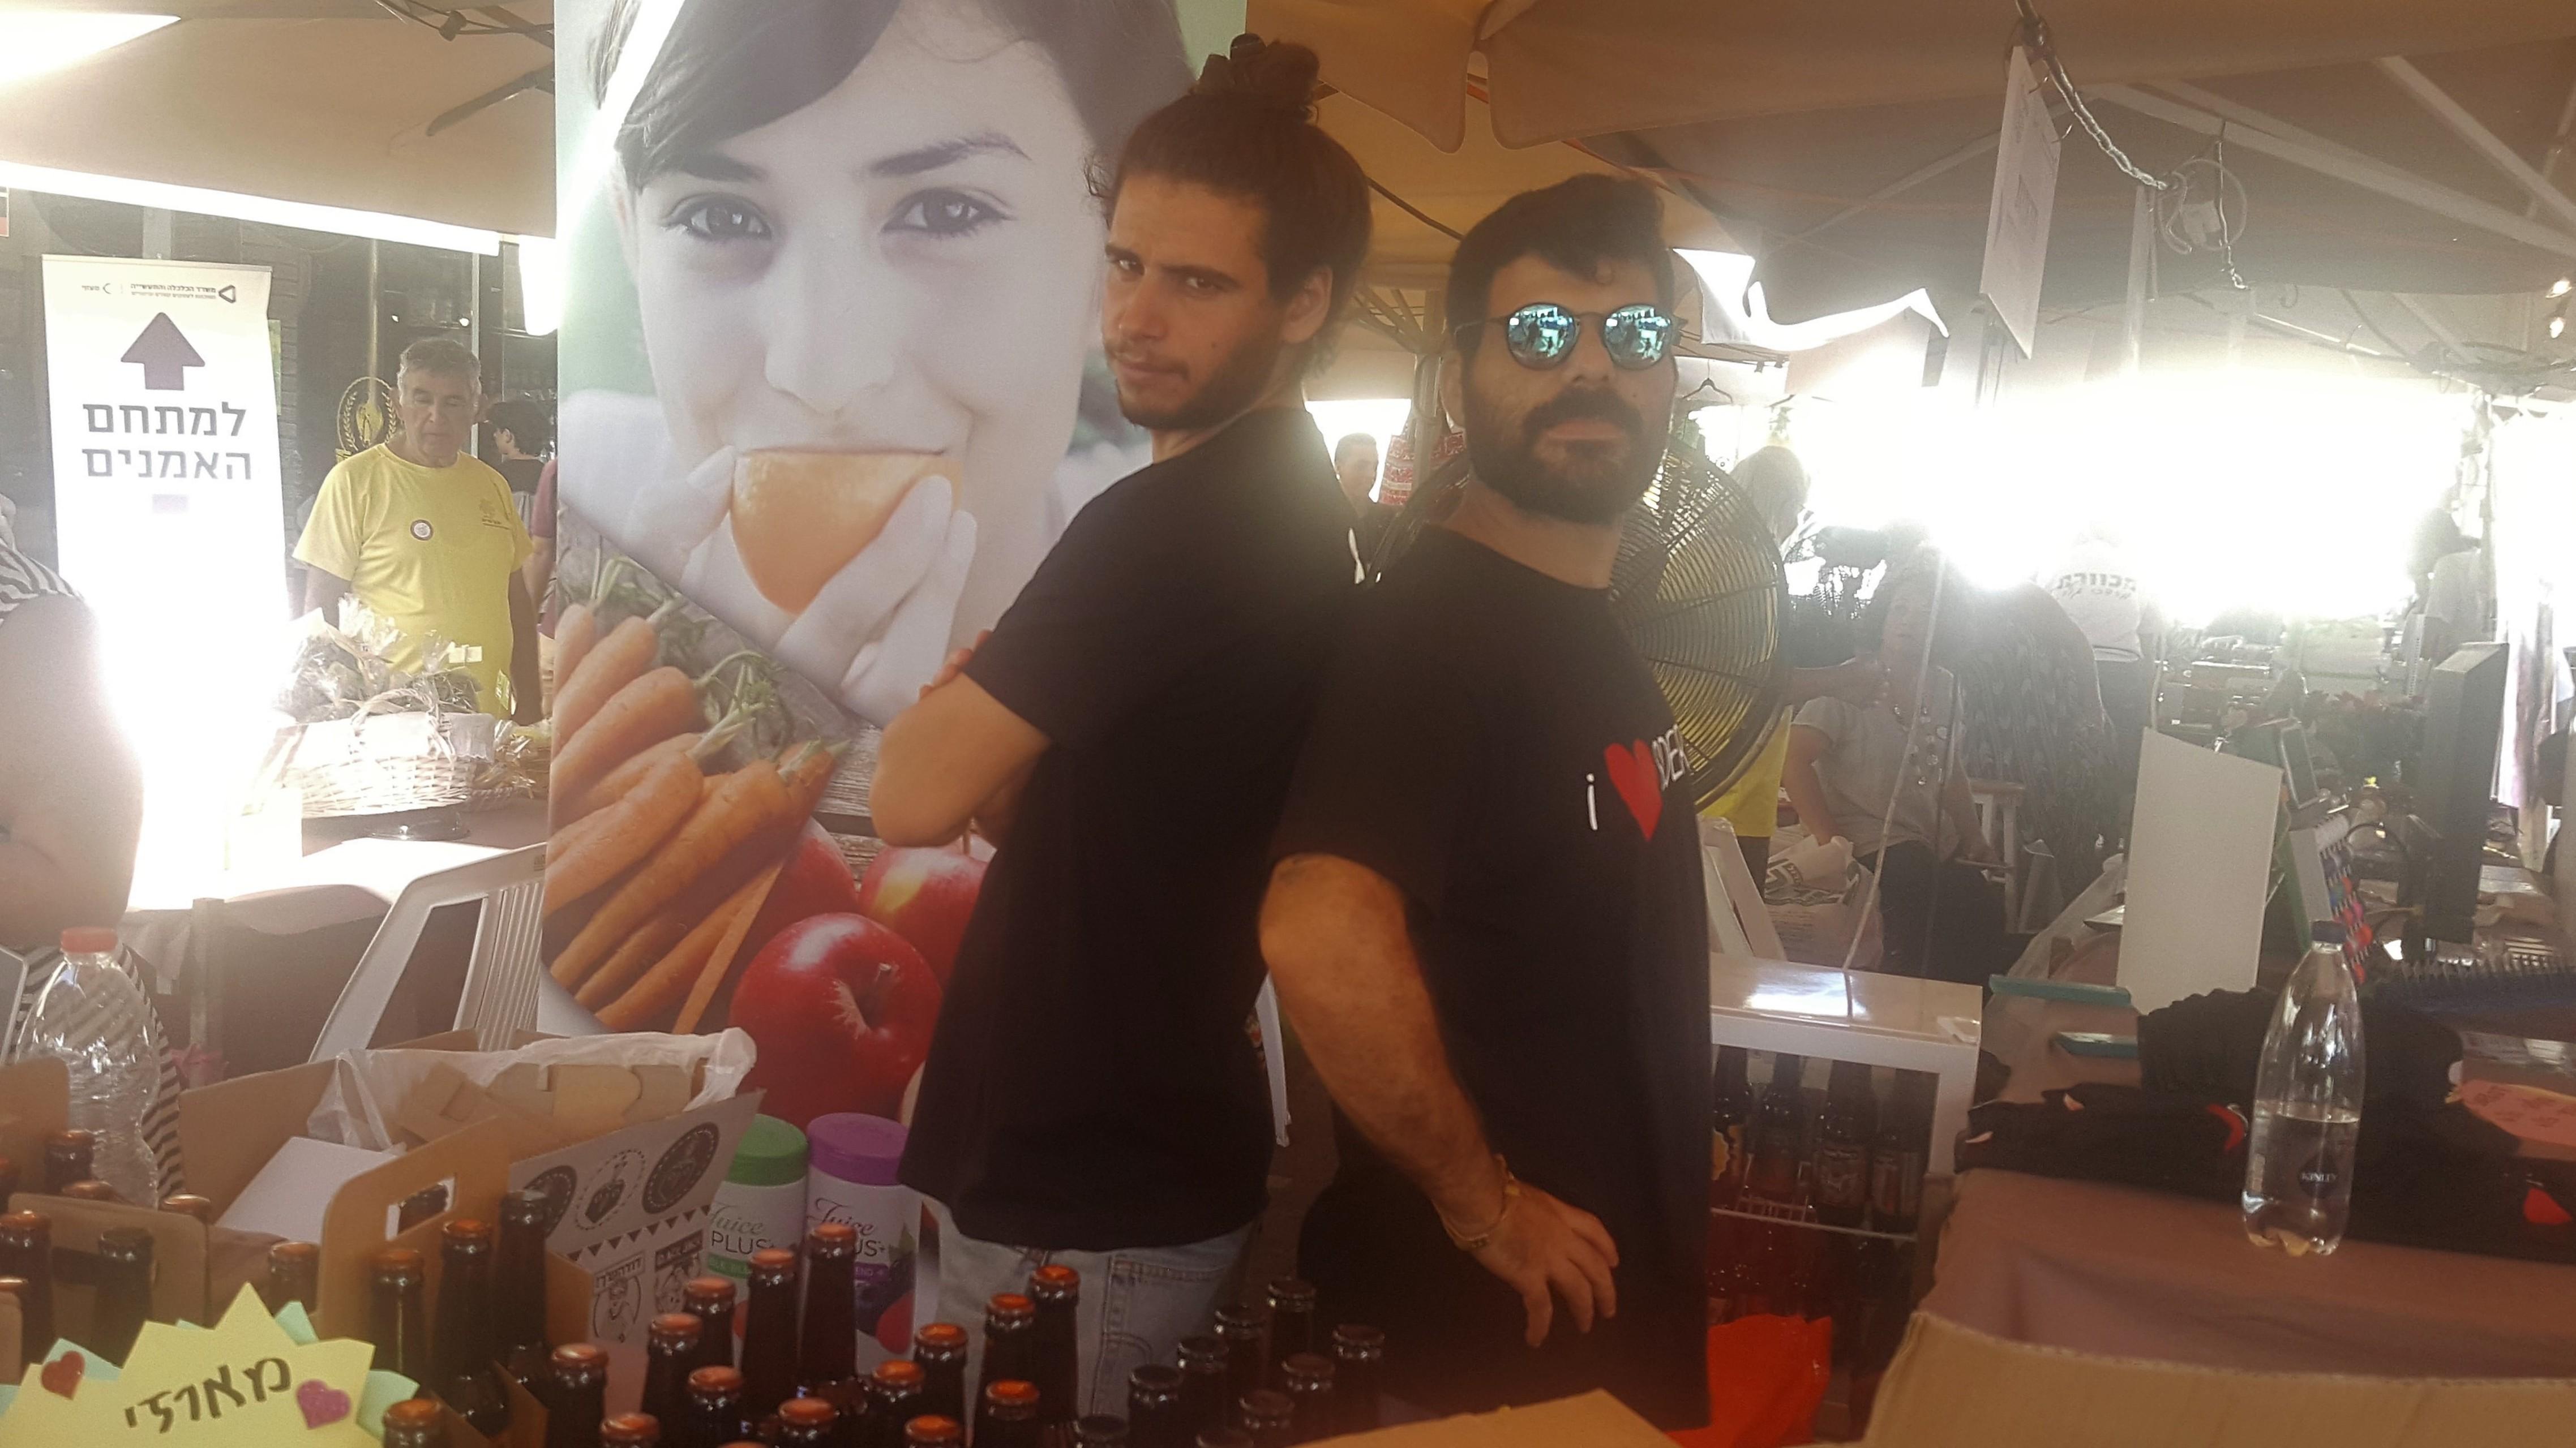 Owner of Pub Sderot Hen Vaknin and colleague Eran Ben-Gal (Eytan Halon)